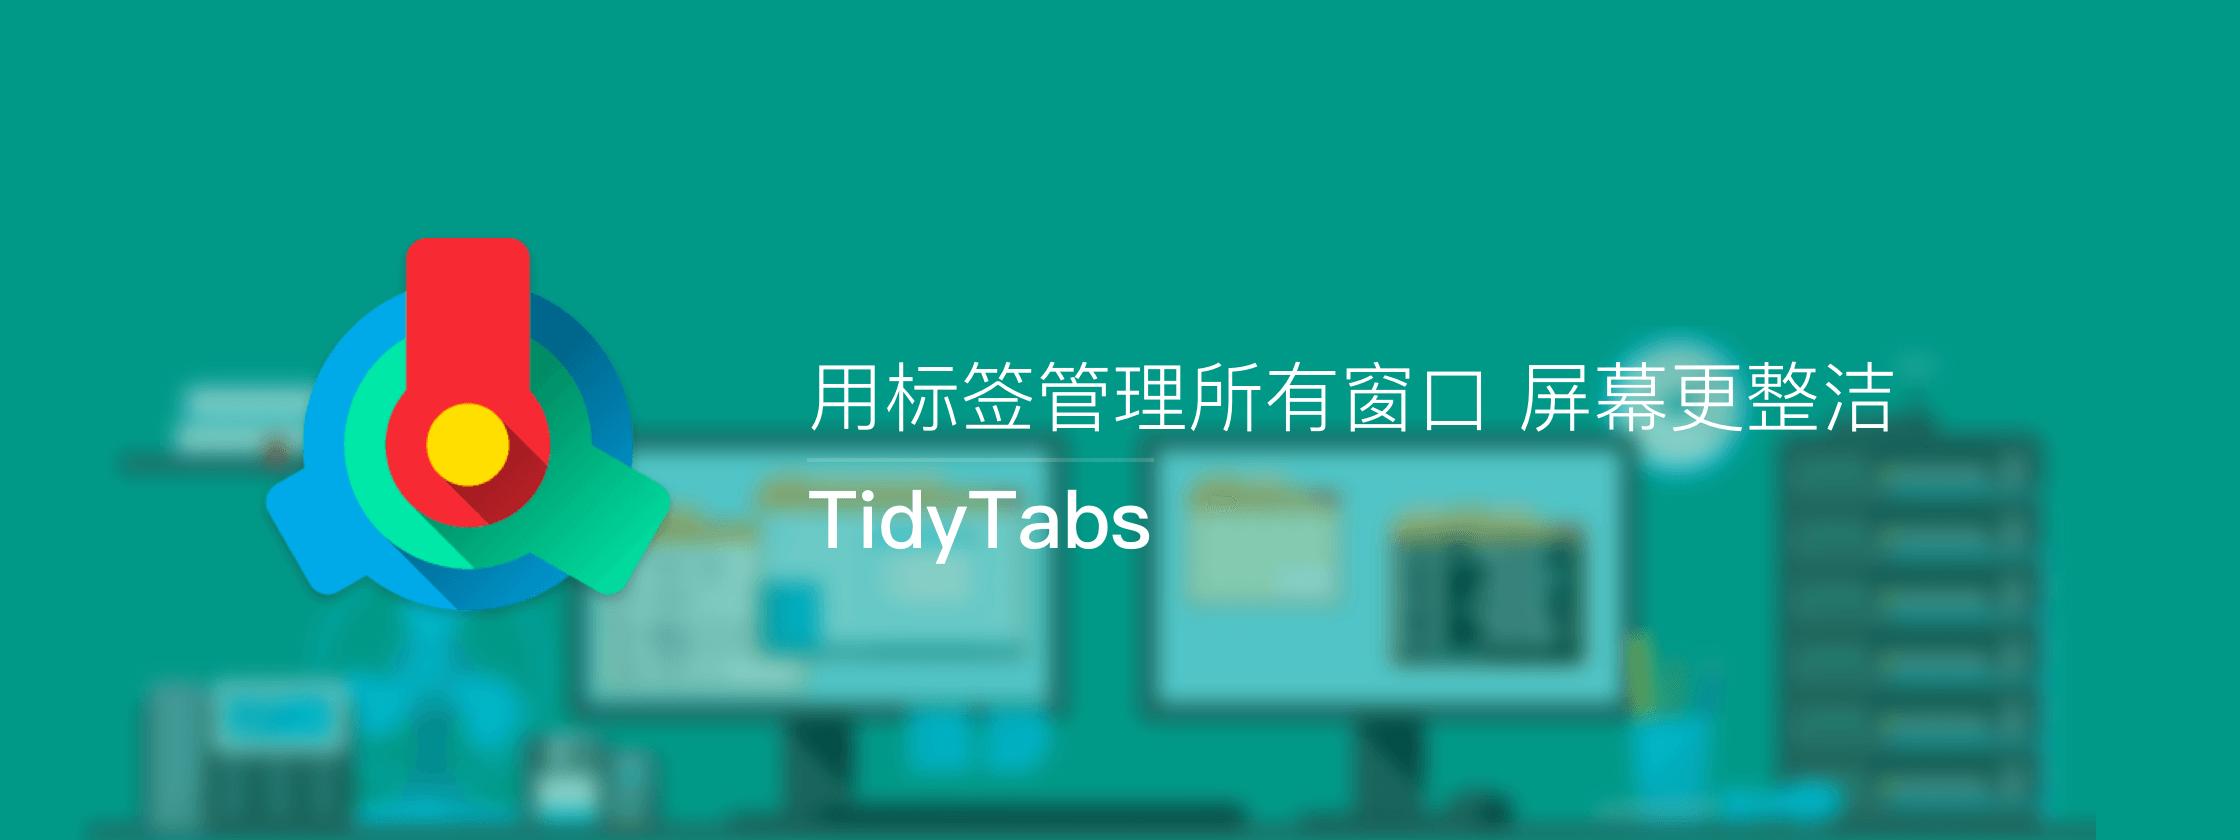 TidyTabs – 用标签管理所有窗口 屏幕更整洁